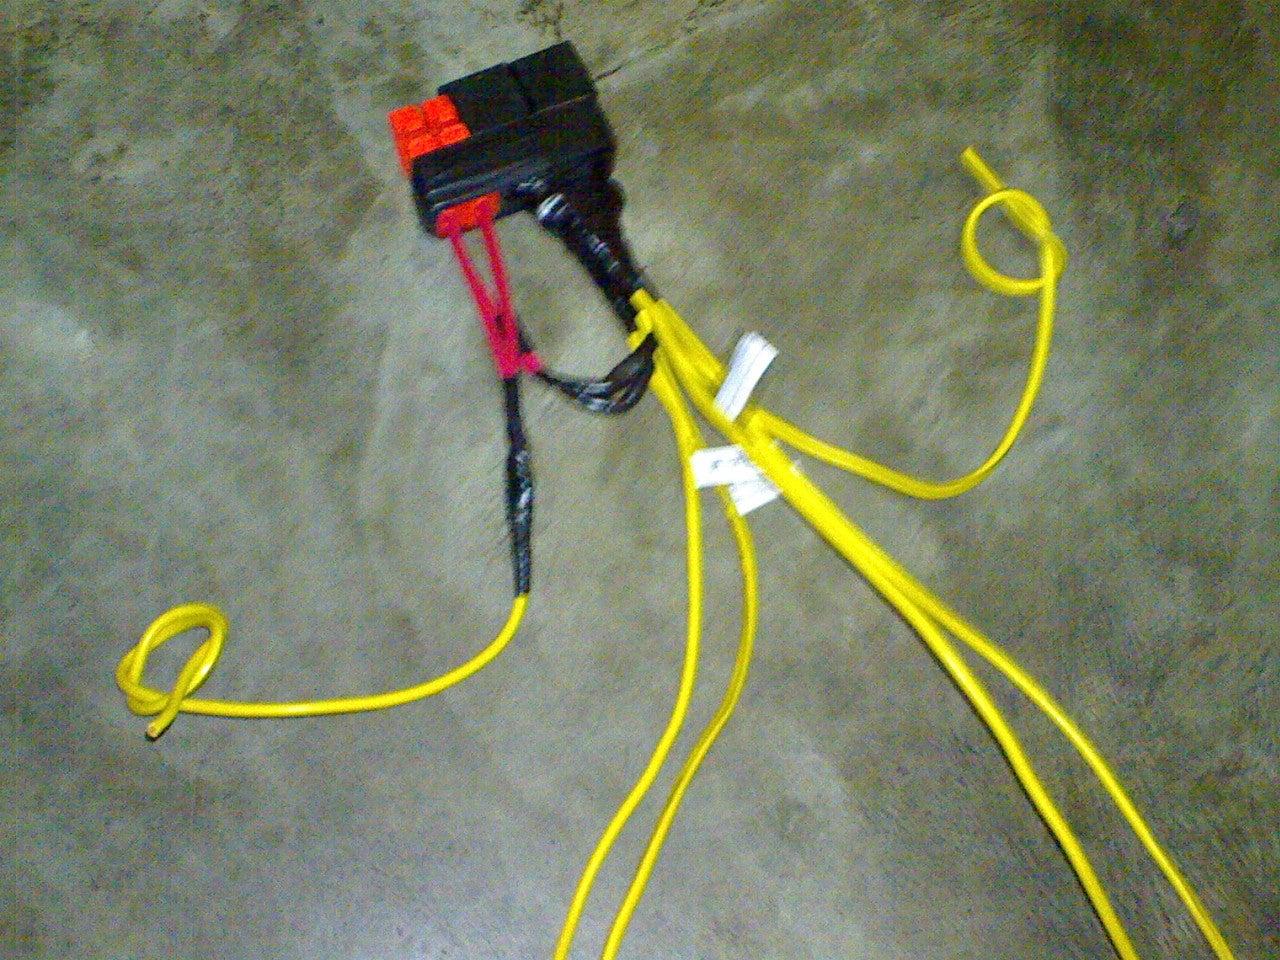 Headlight Plug Wiring Diagram from cdn.instructables.com